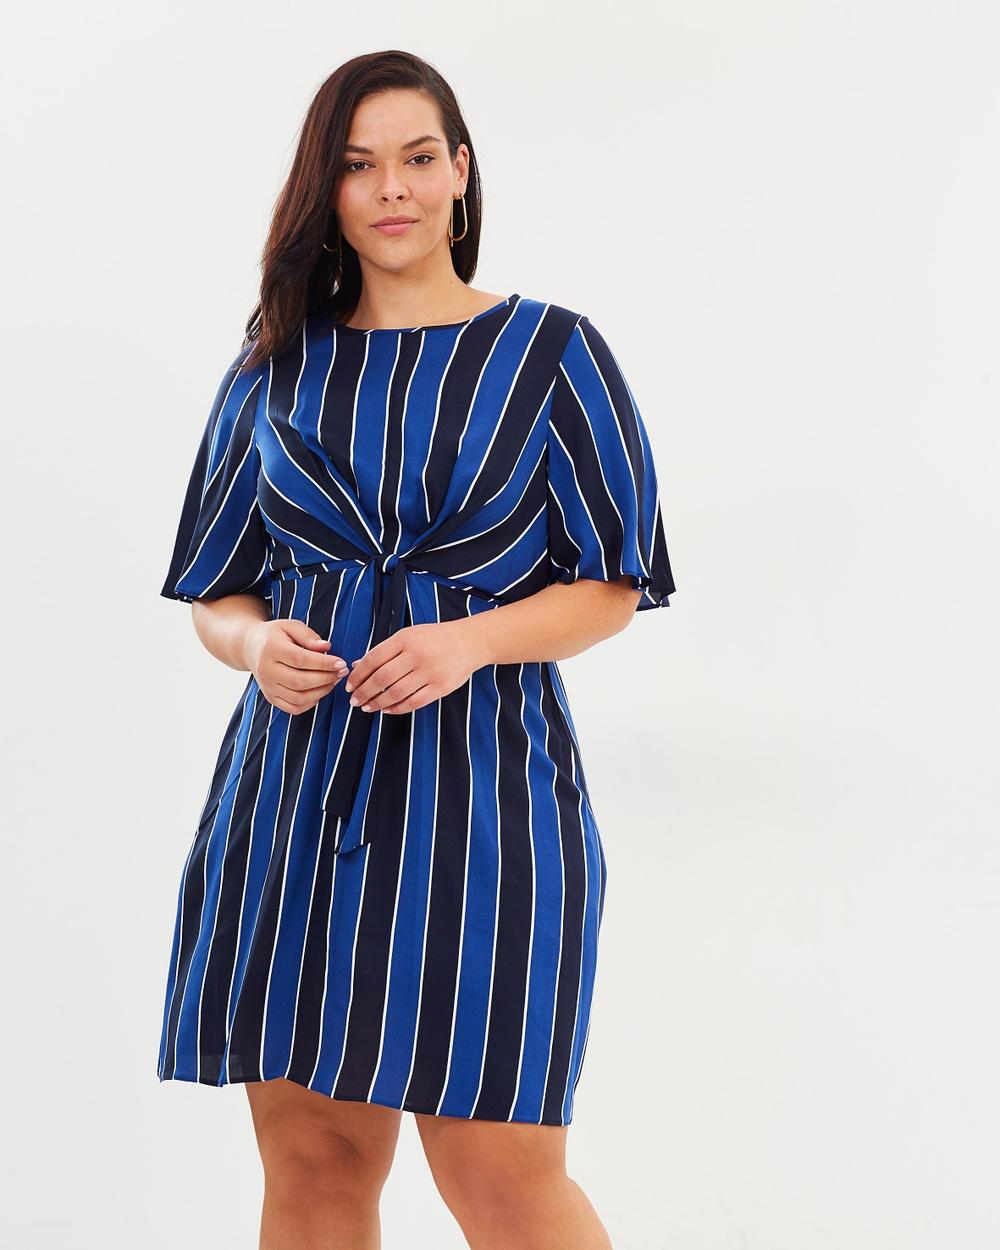 DP Curve Stripe Manipulated Shift Dress Printed Dresses Blue & Black Stripe Manipulated Shift Dress